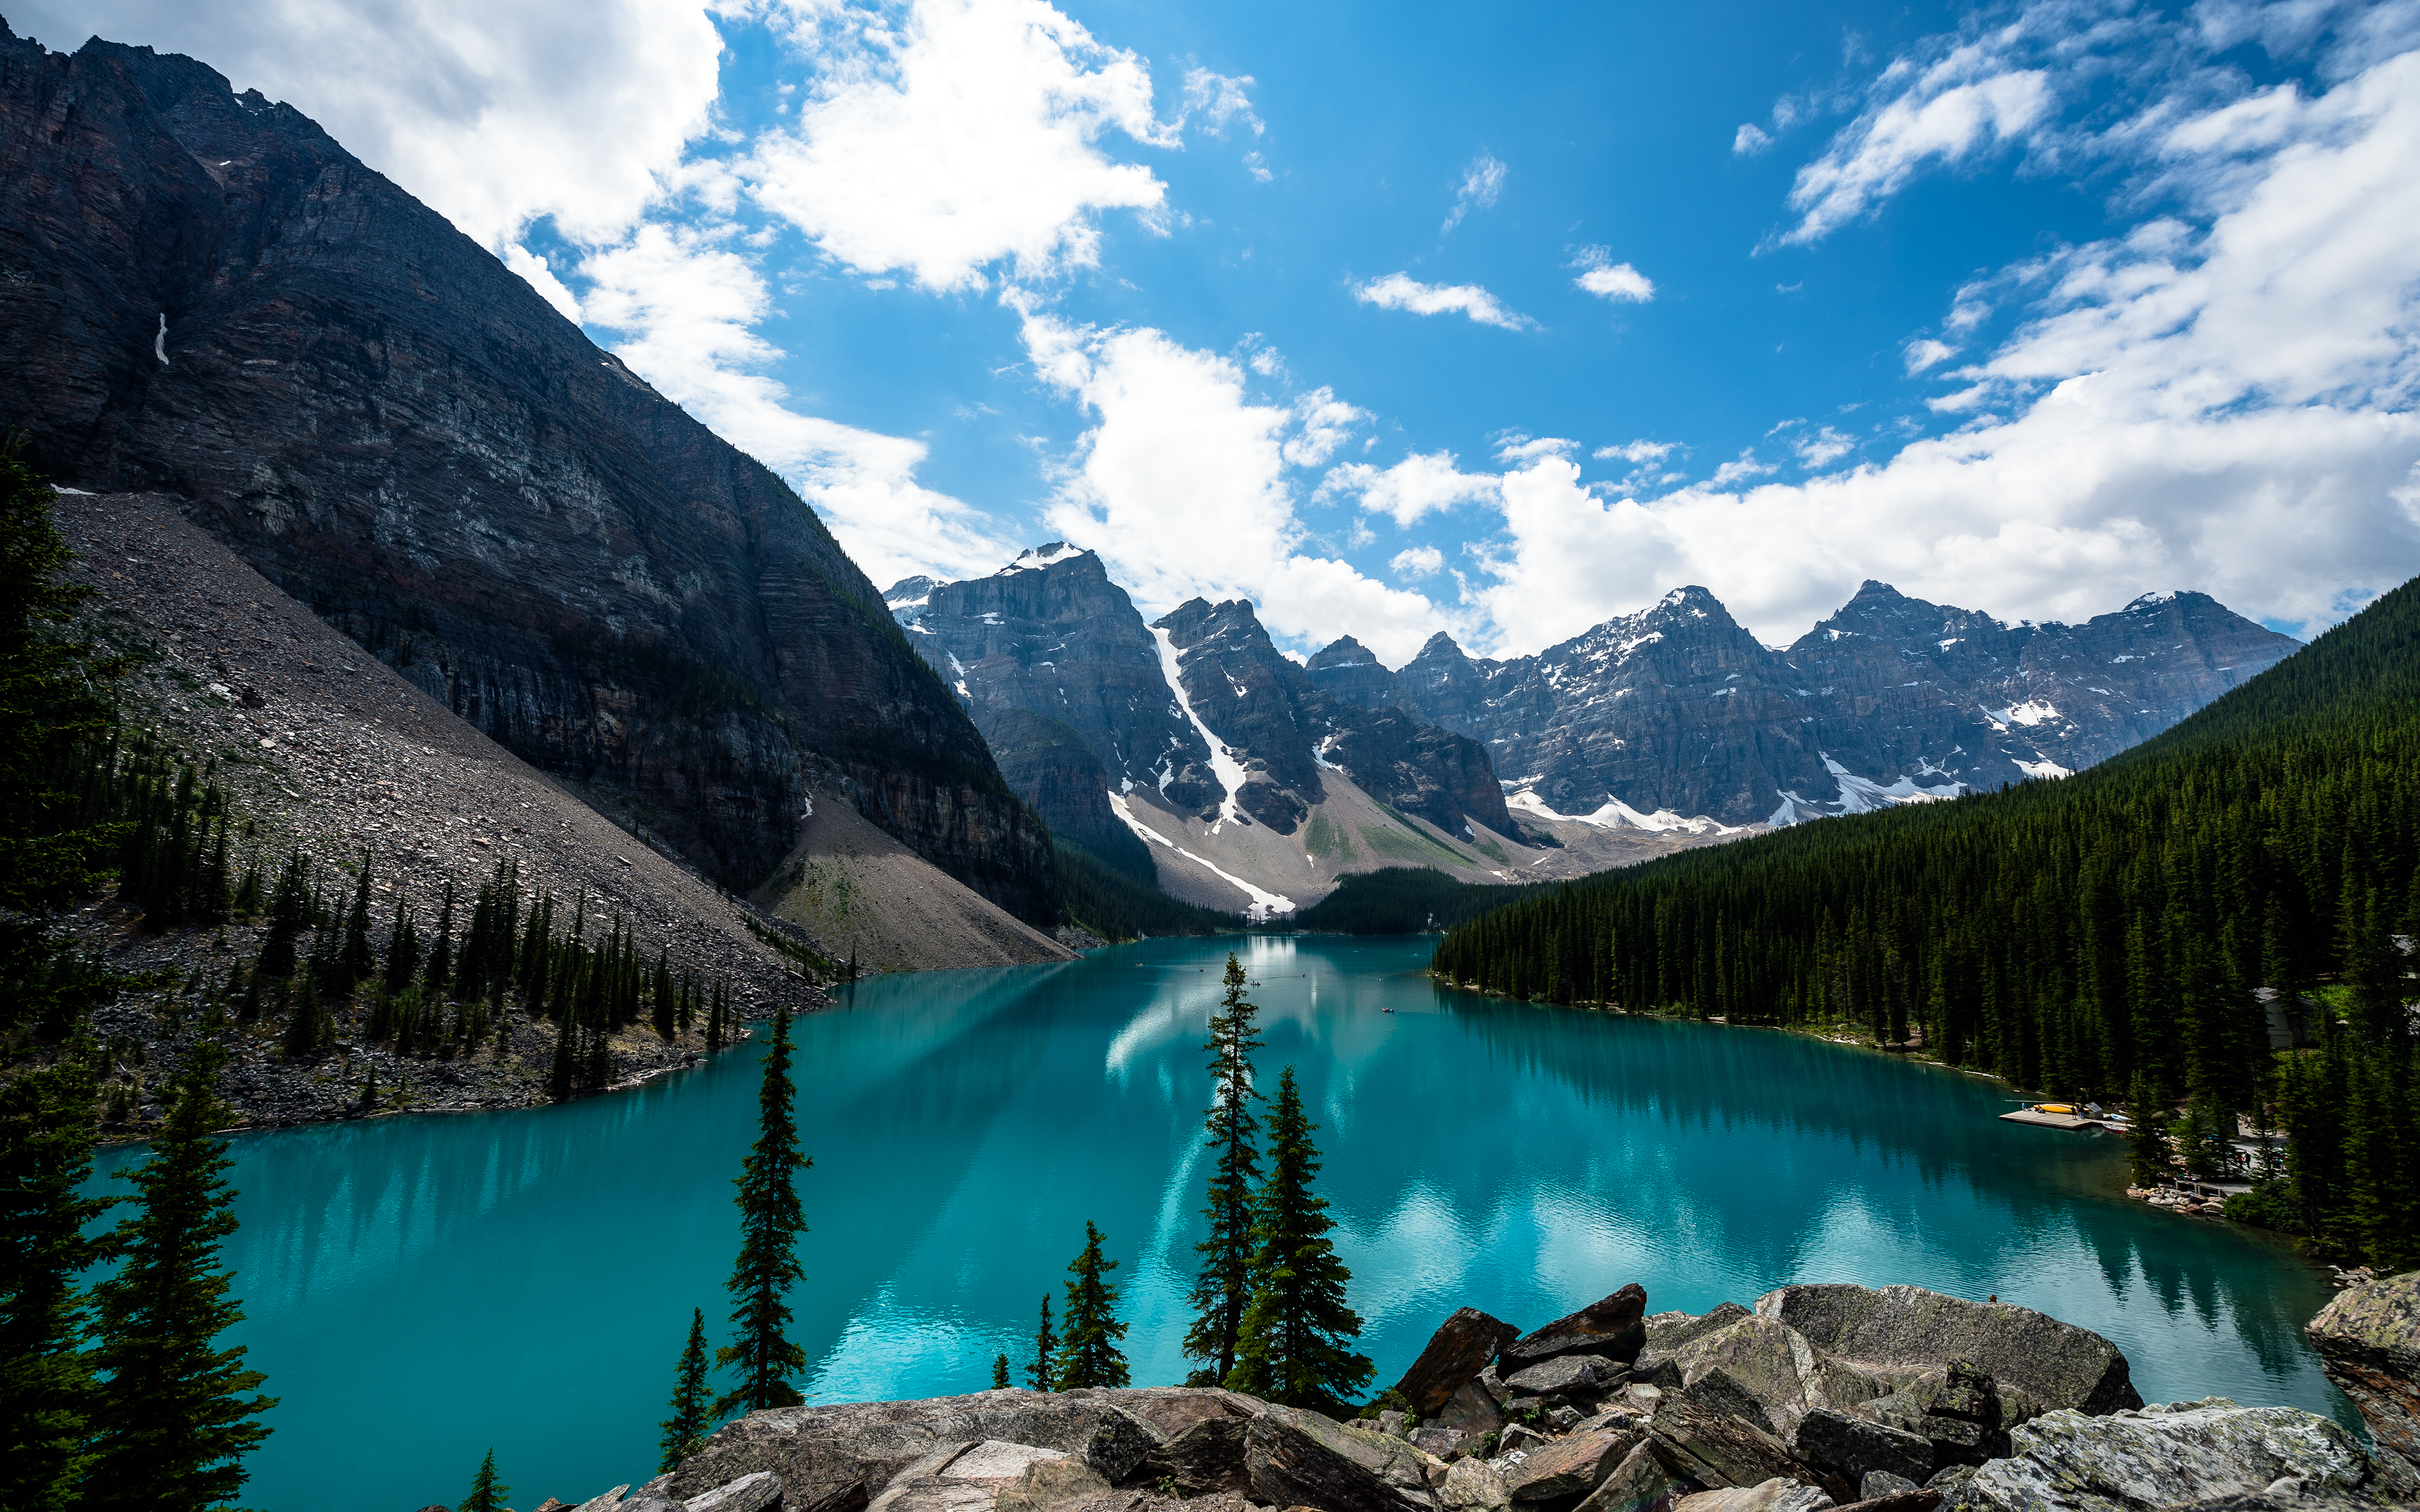 132377 Moraine Lake Banff National Park Lake Louise Canada 3840x2400